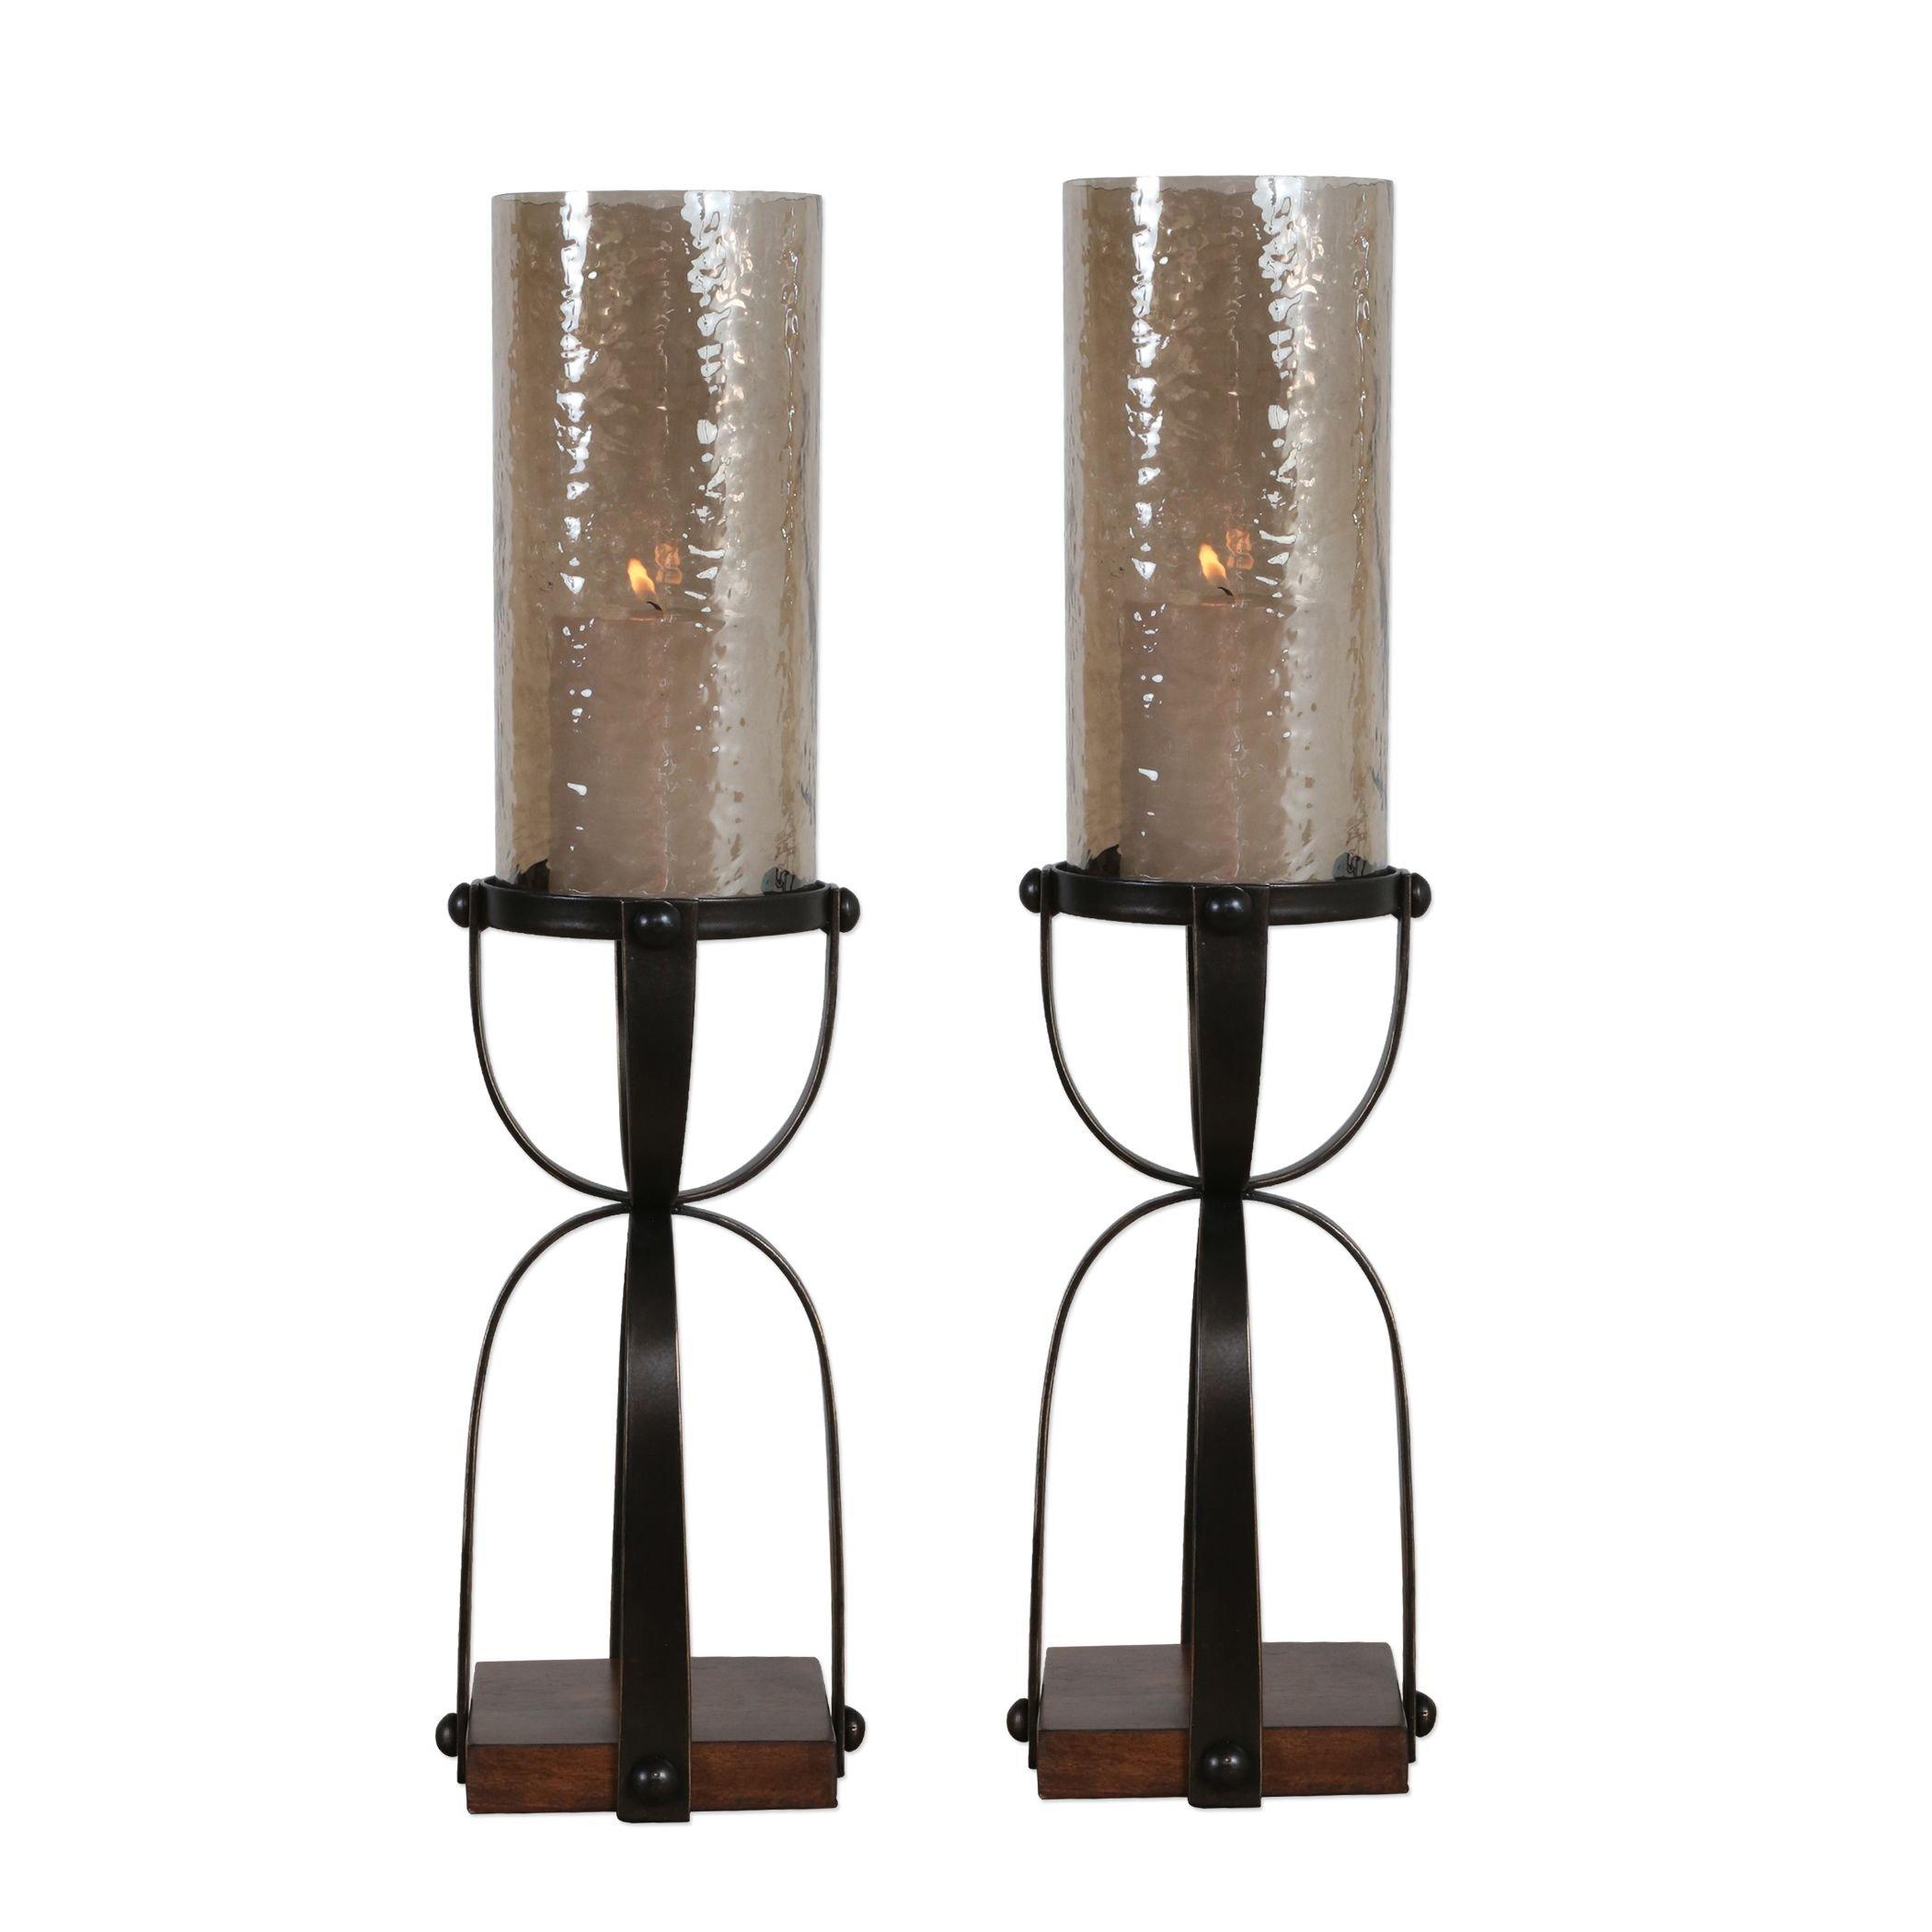 Candle Holder in Dark Bronze - Set of 2